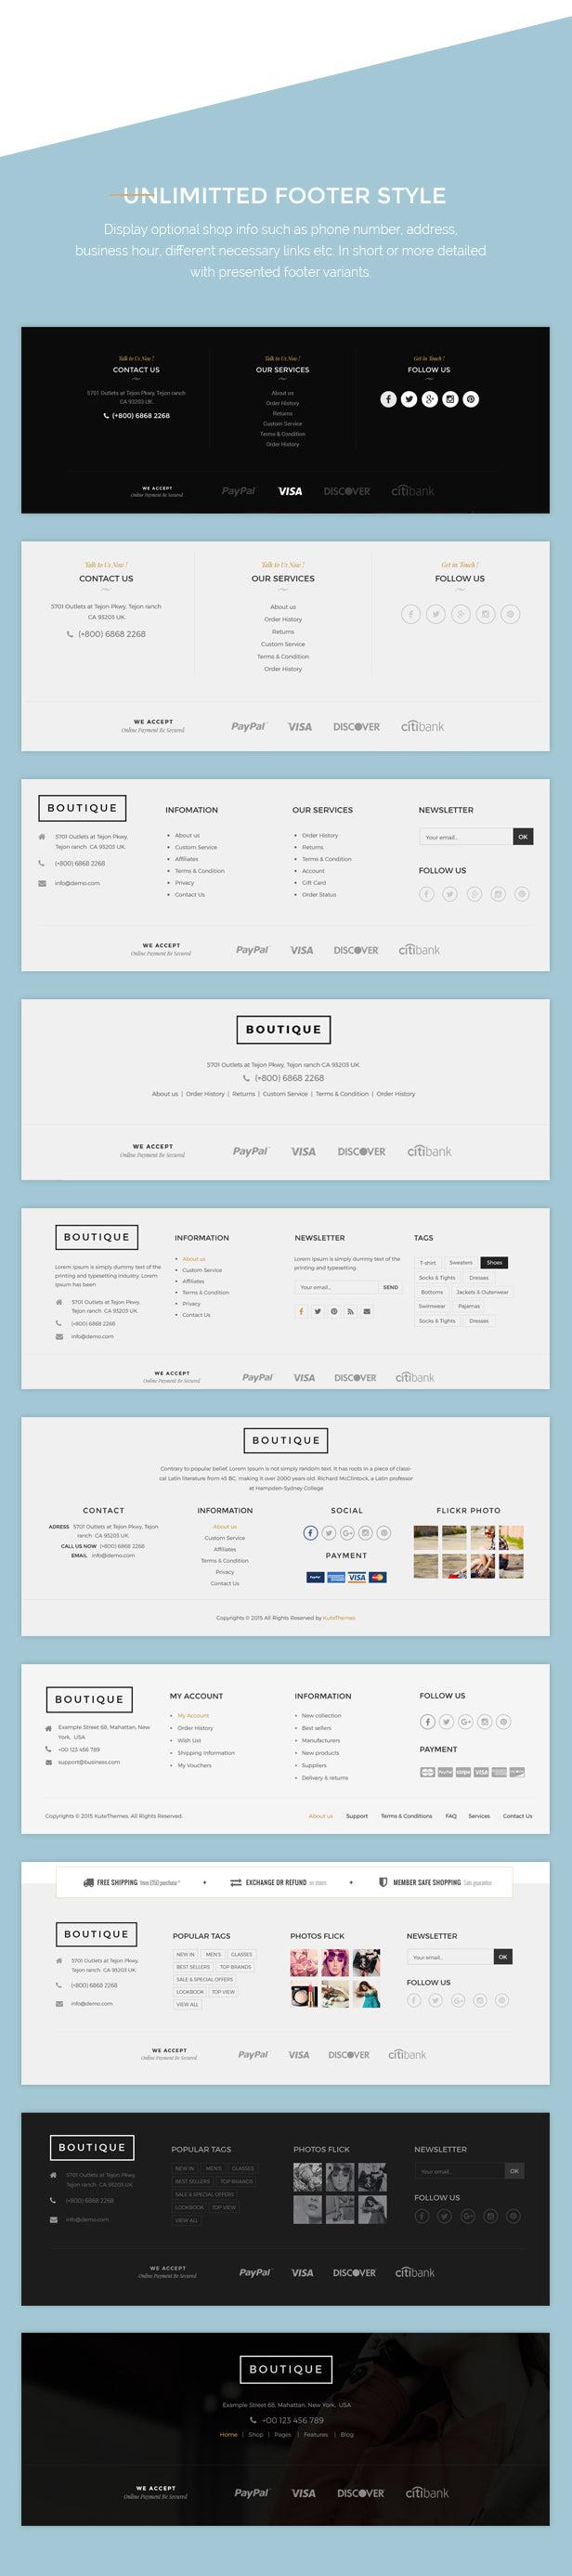 Boutique - Responsive Shopify Theme - 15